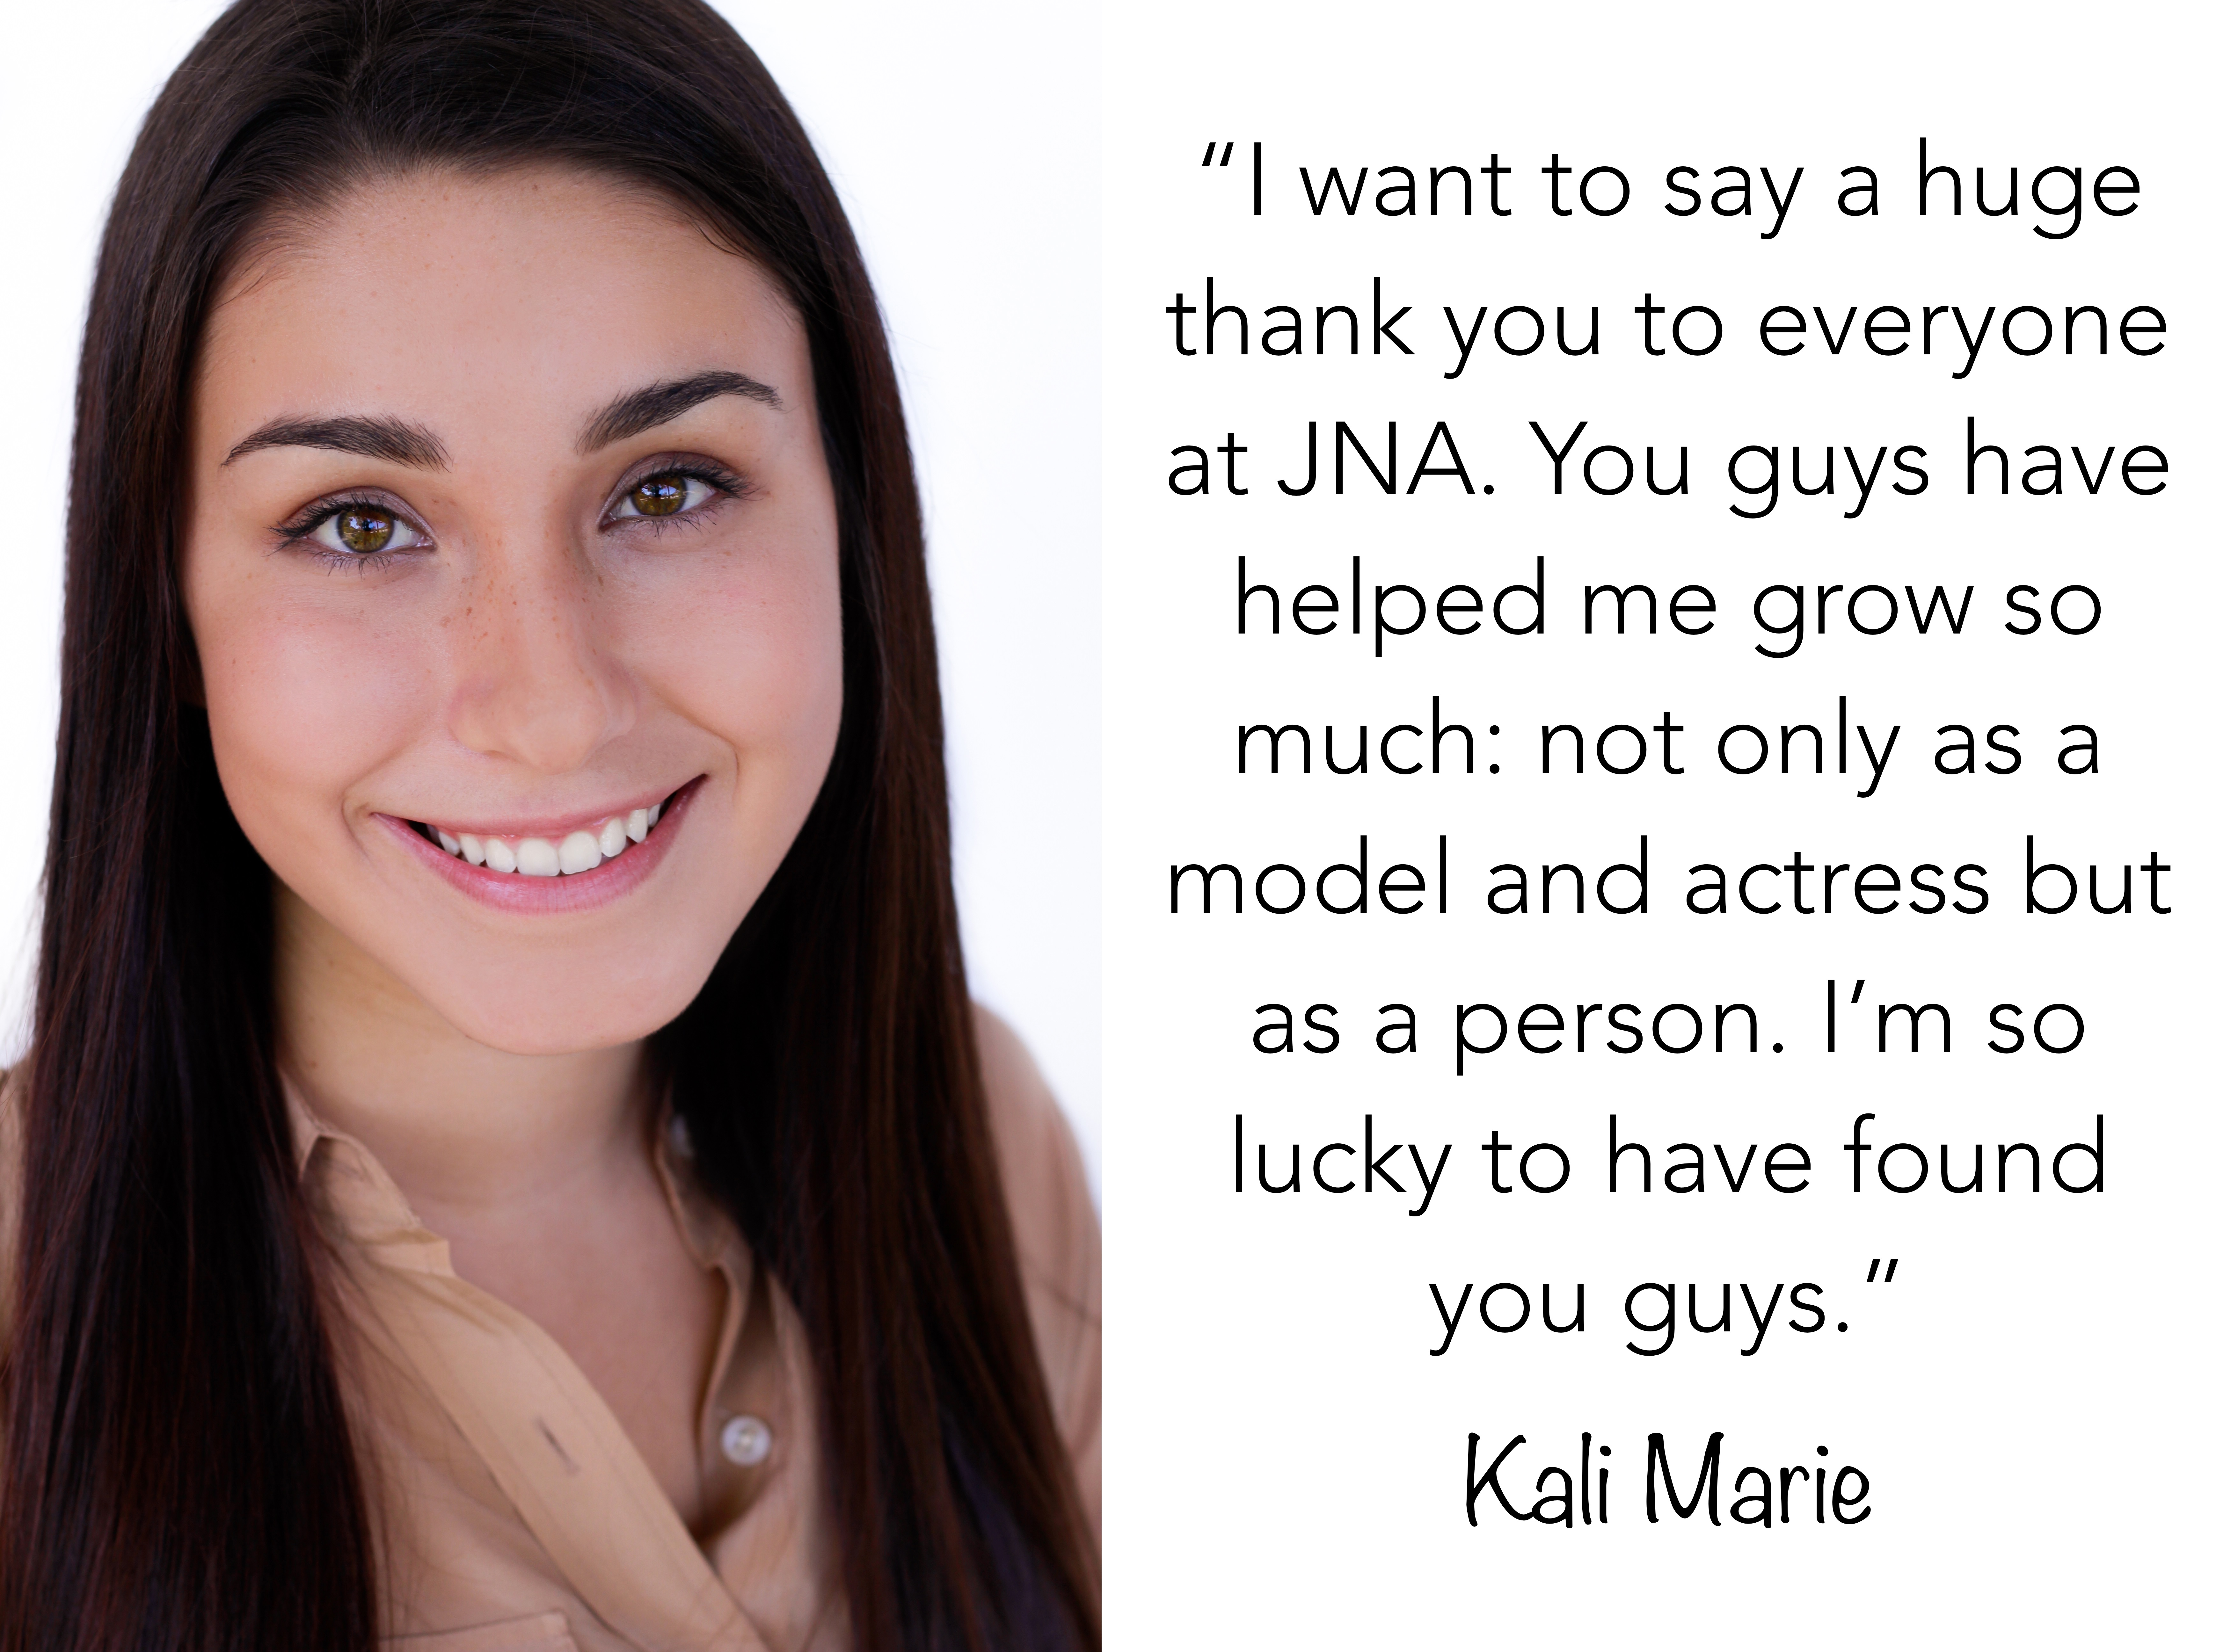 Kali Marie